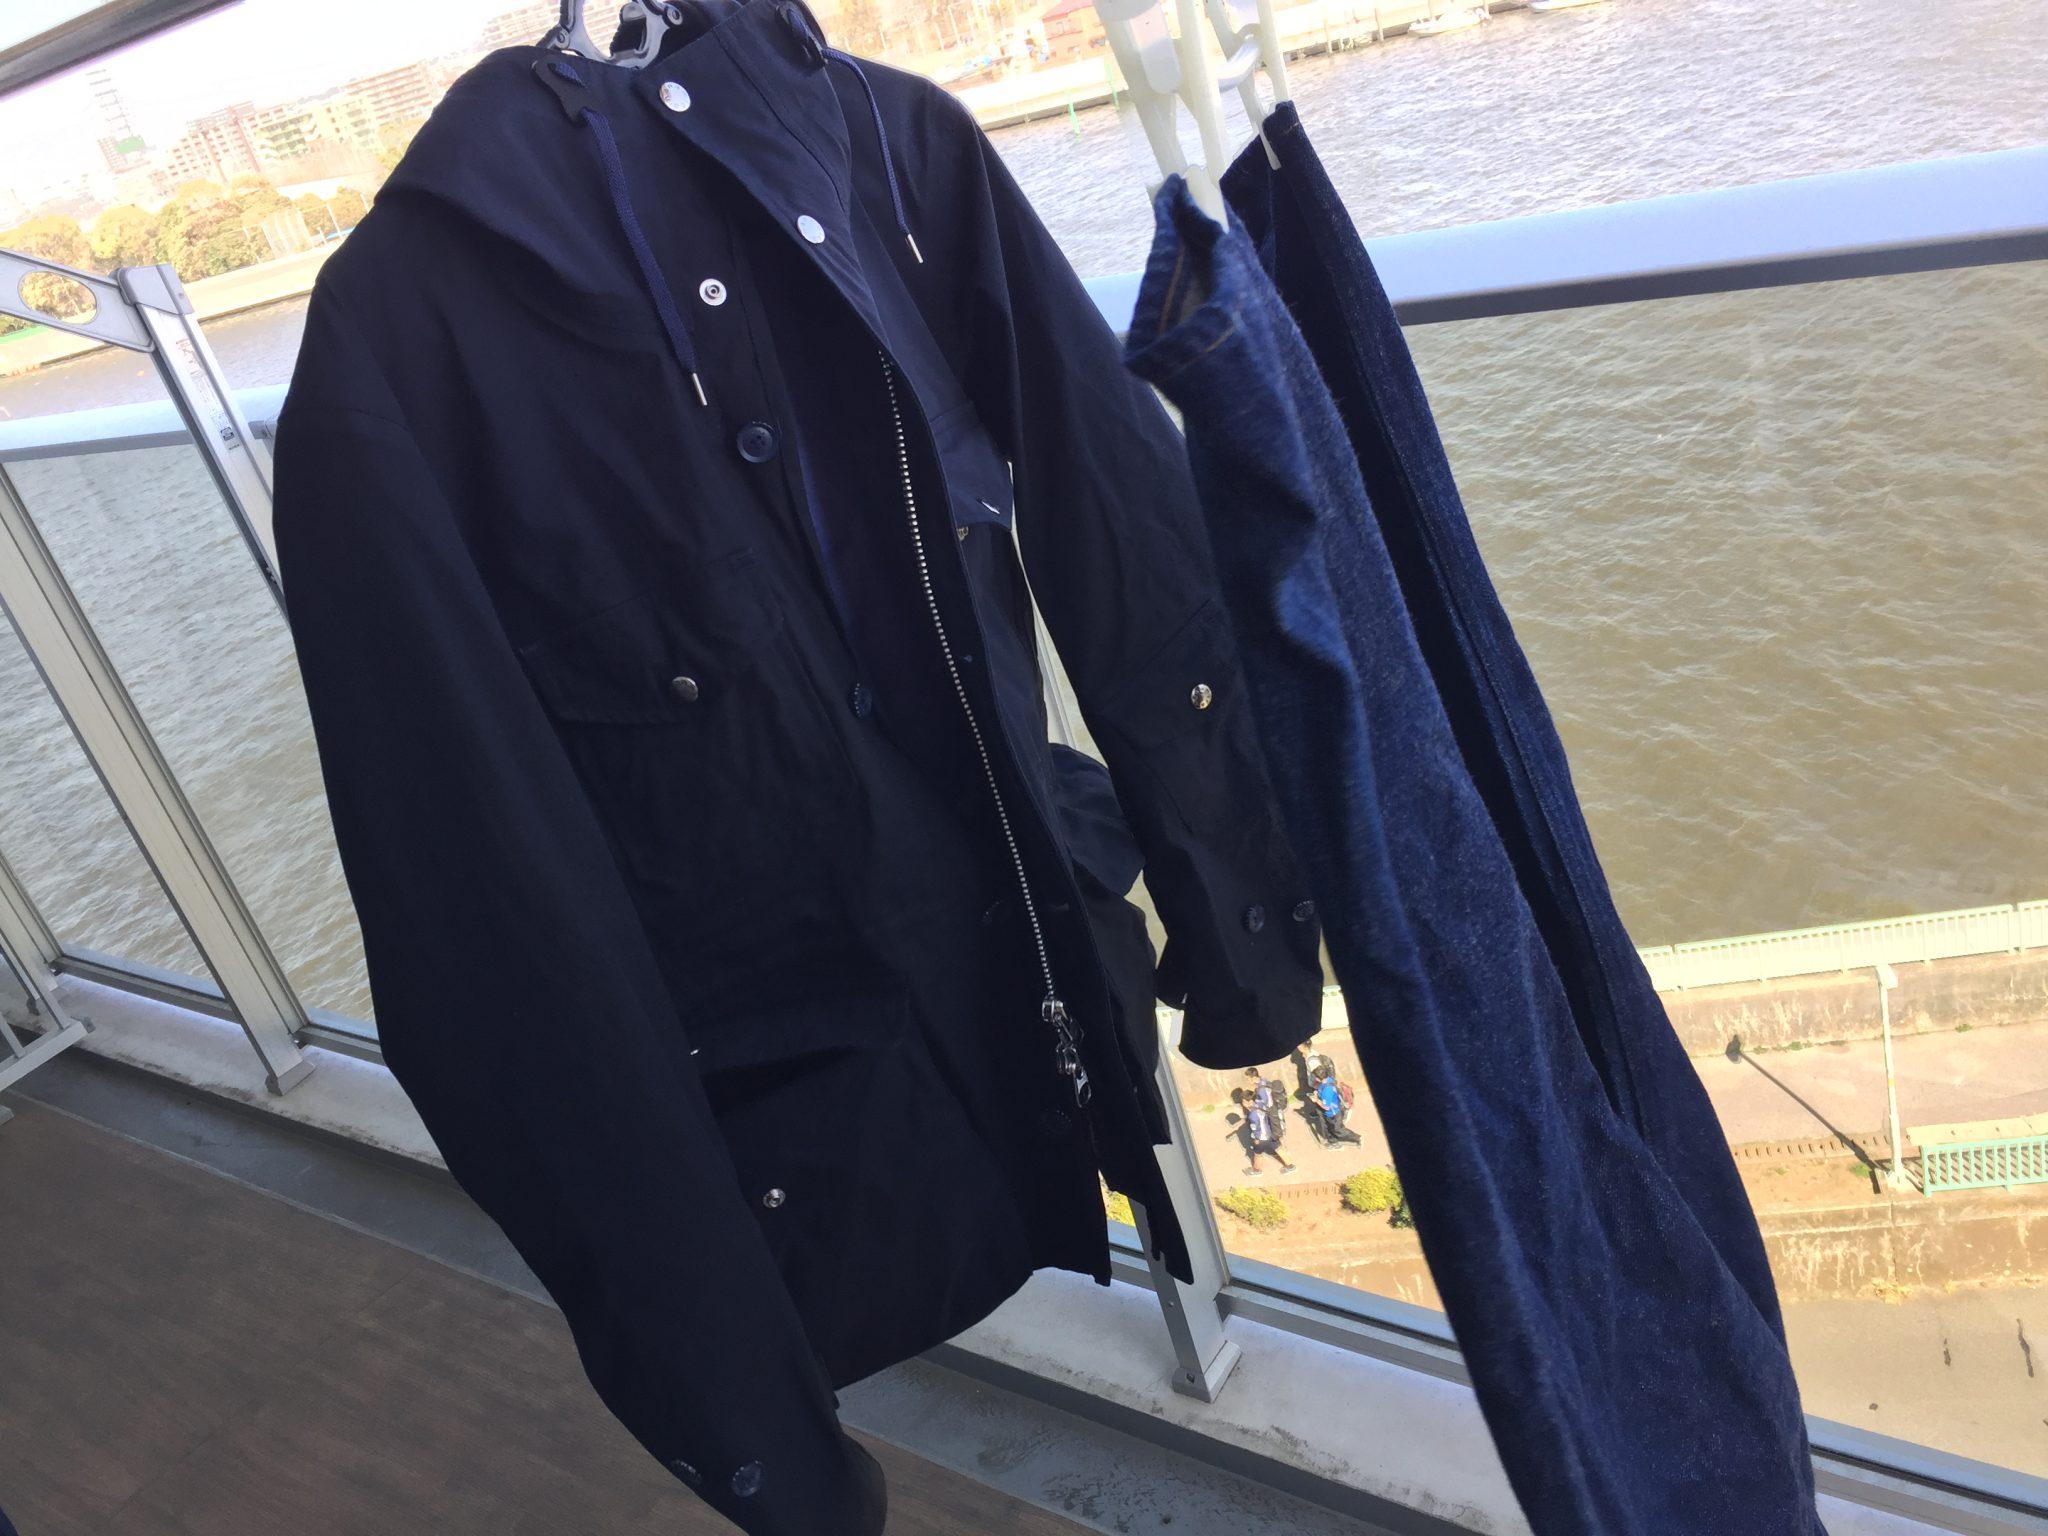 nanamica(ナナミカ)GORE-TEX Cruiser Jacket|自宅で洗濯(3回目)~購入当時とエイジング(経年変化)を比較します